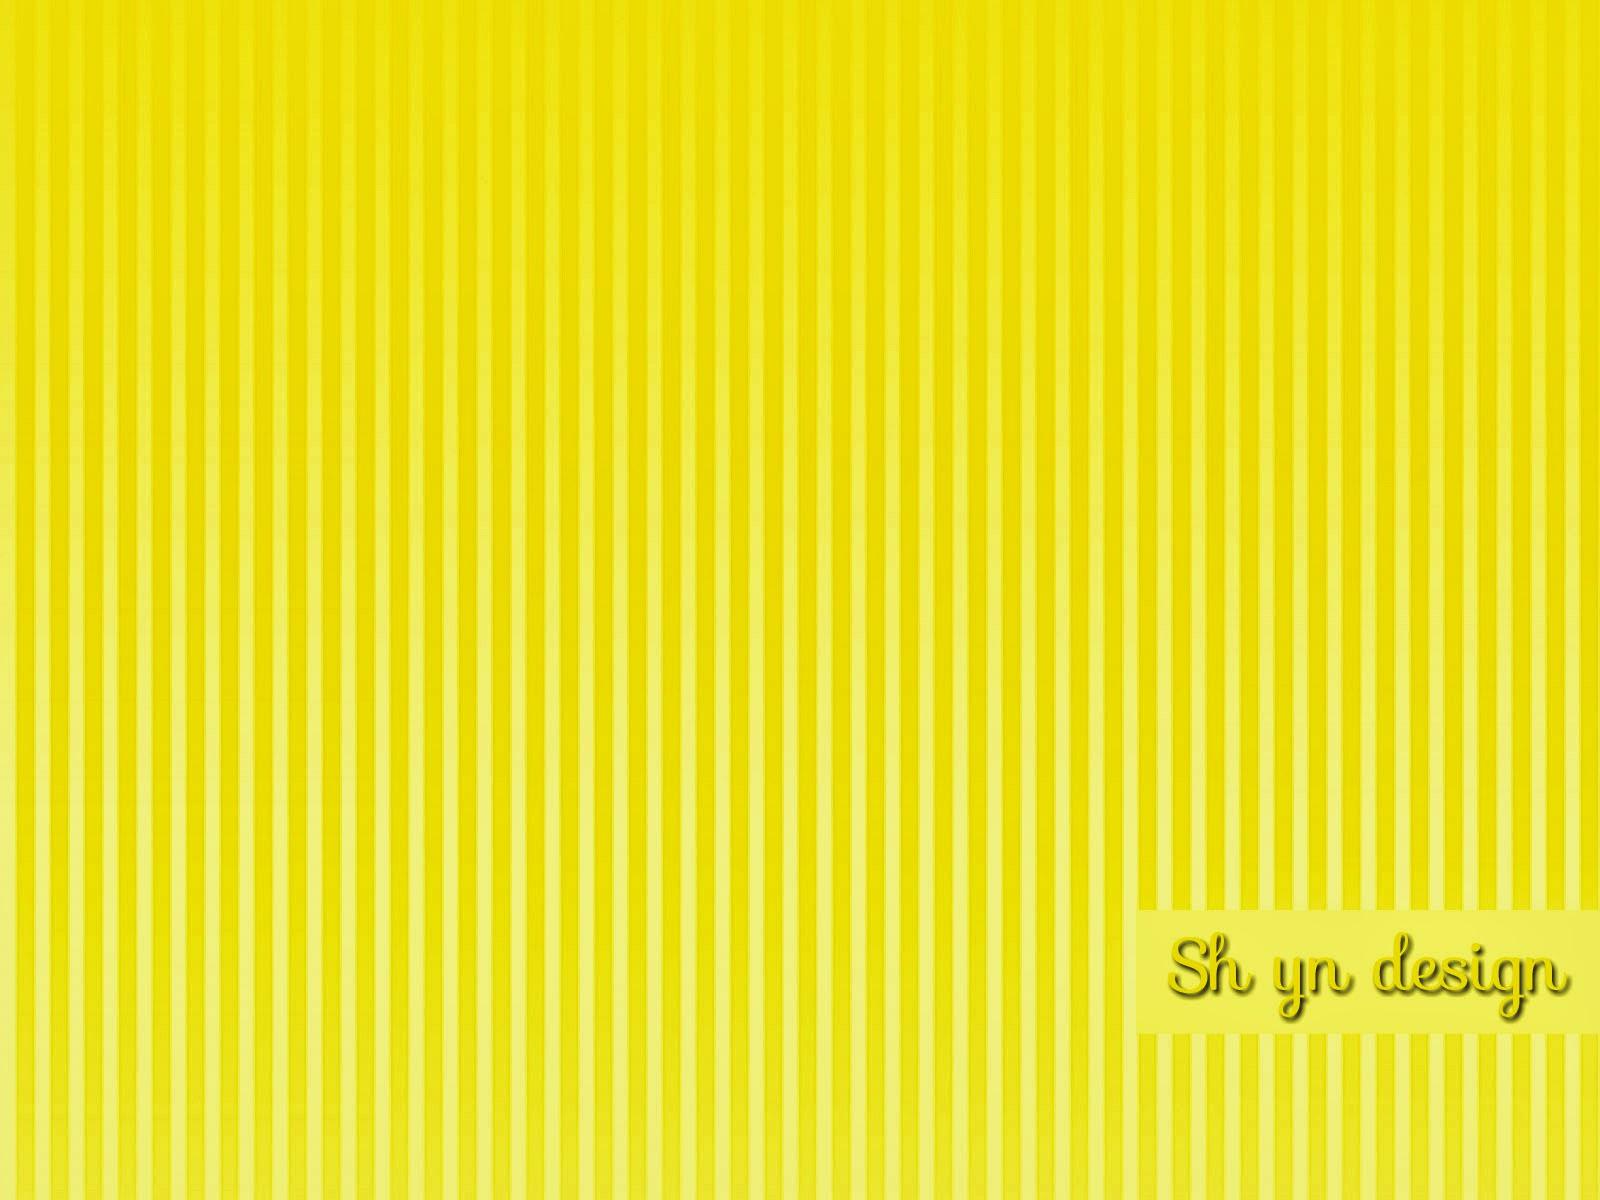 Sh Yn Design: Stripe Wallpaper - Yellow Red Pink Stripe